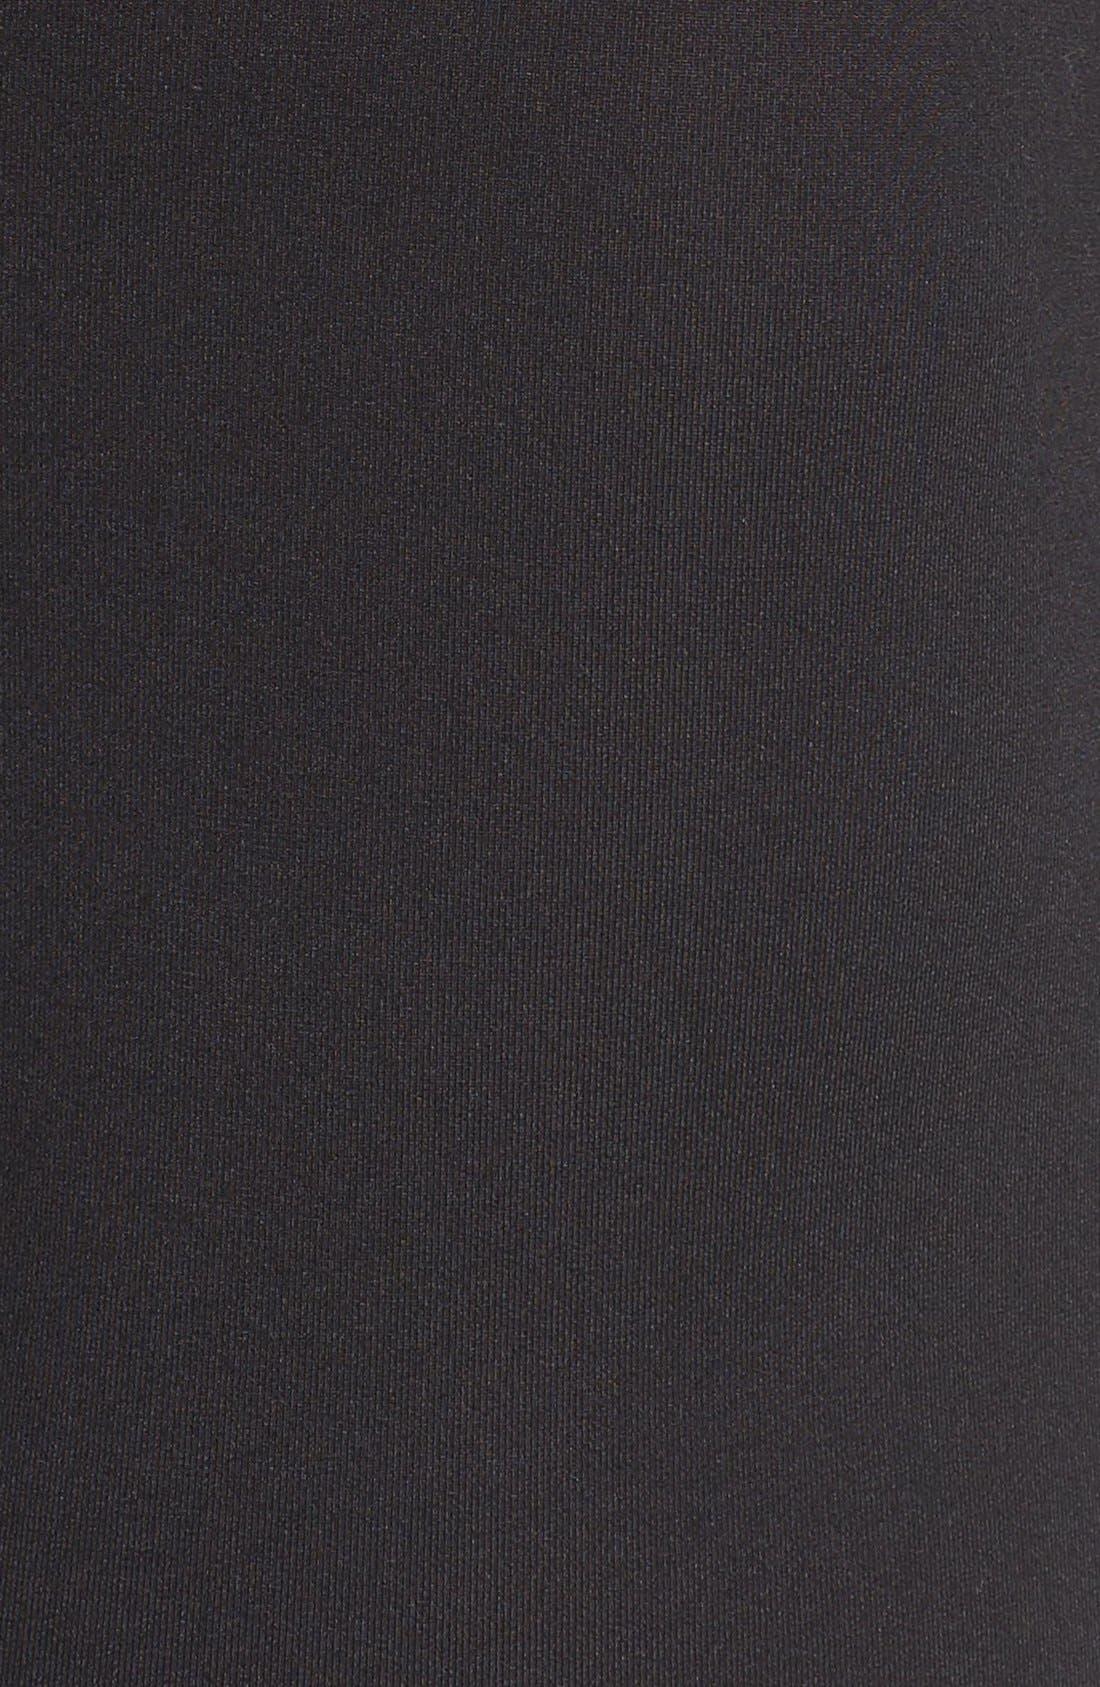 'ck one - U8516' Low Rise Trunks,                             Alternate thumbnail 4, color,                             001